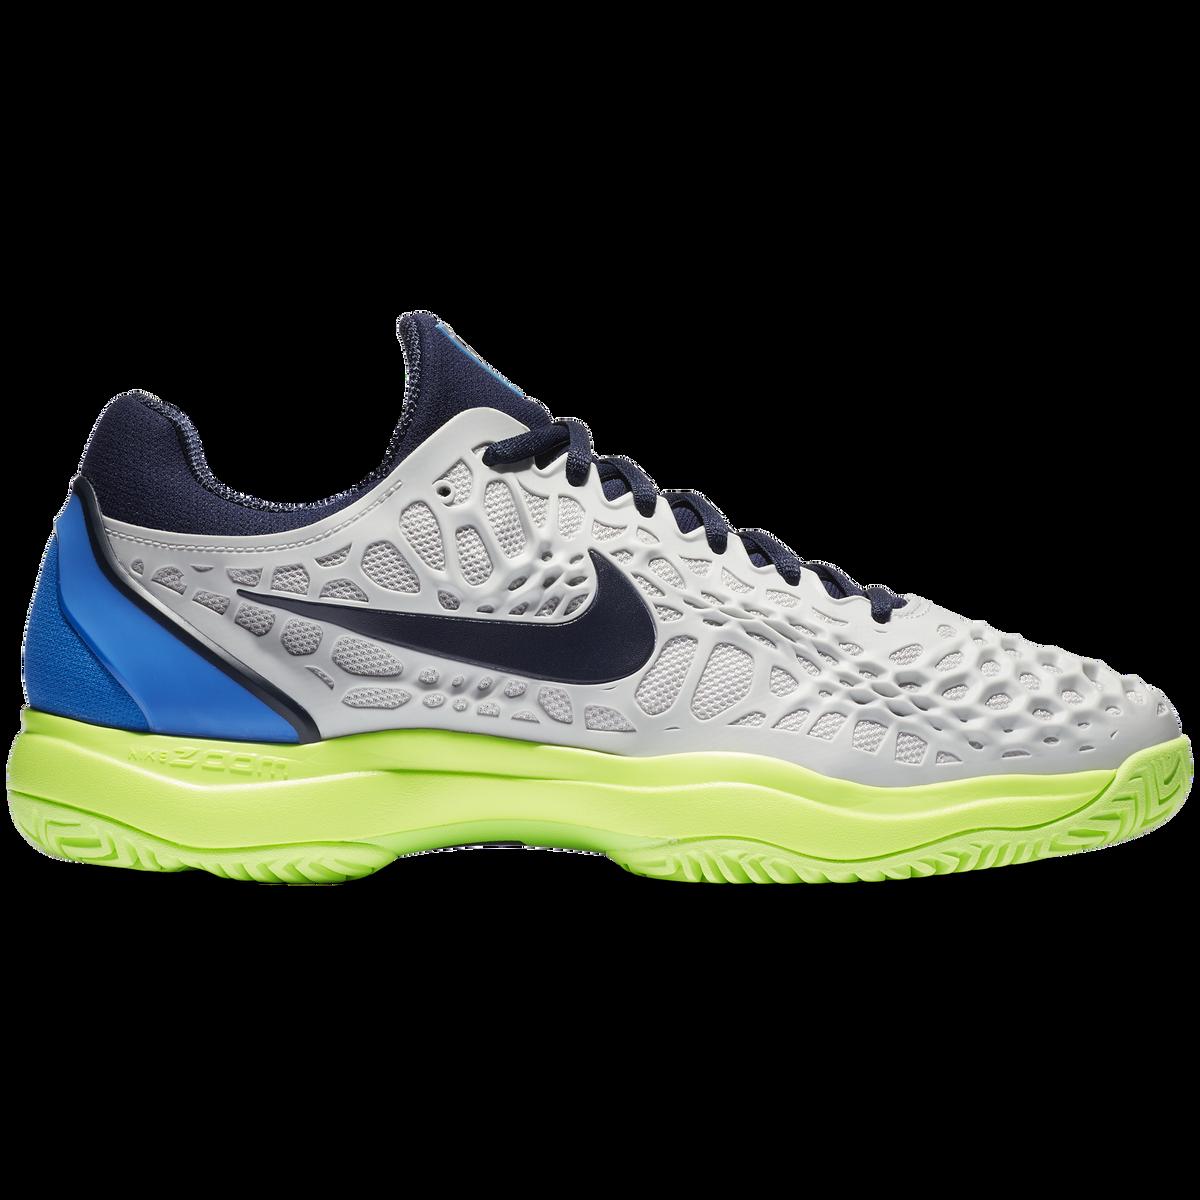 9d5bf96629c Images. Nike Zoom Cage 3 Men  39 s Tennis Shoe - Grey Blue